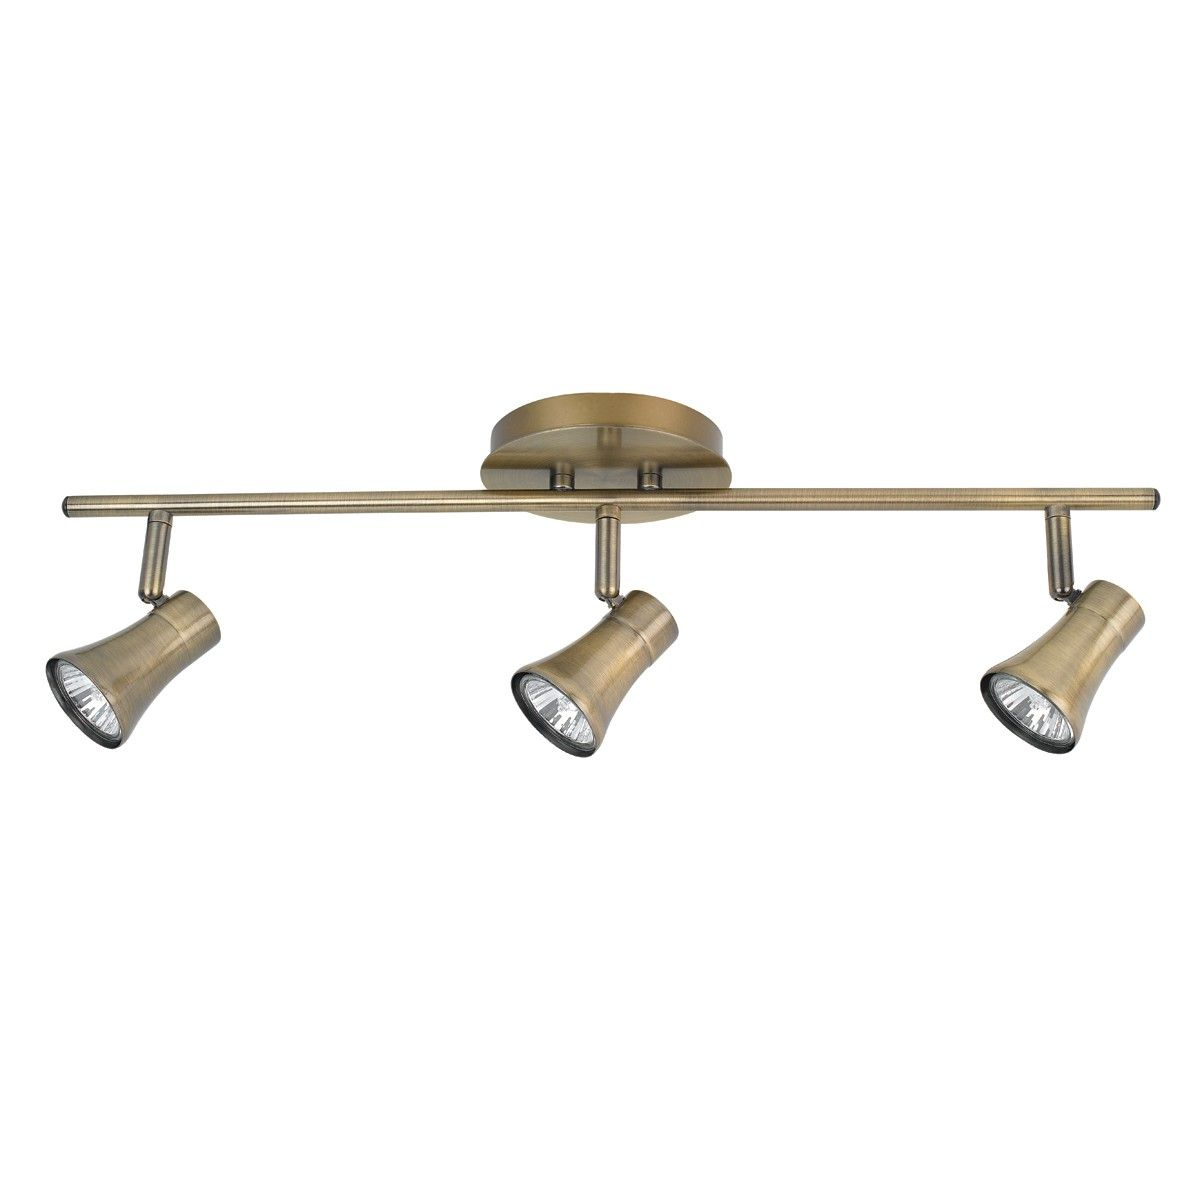 3 light track lighting kit antique brass finish 4498 lighting 3 light track lighting kit antique brass finish 4498 aloadofball Choice Image